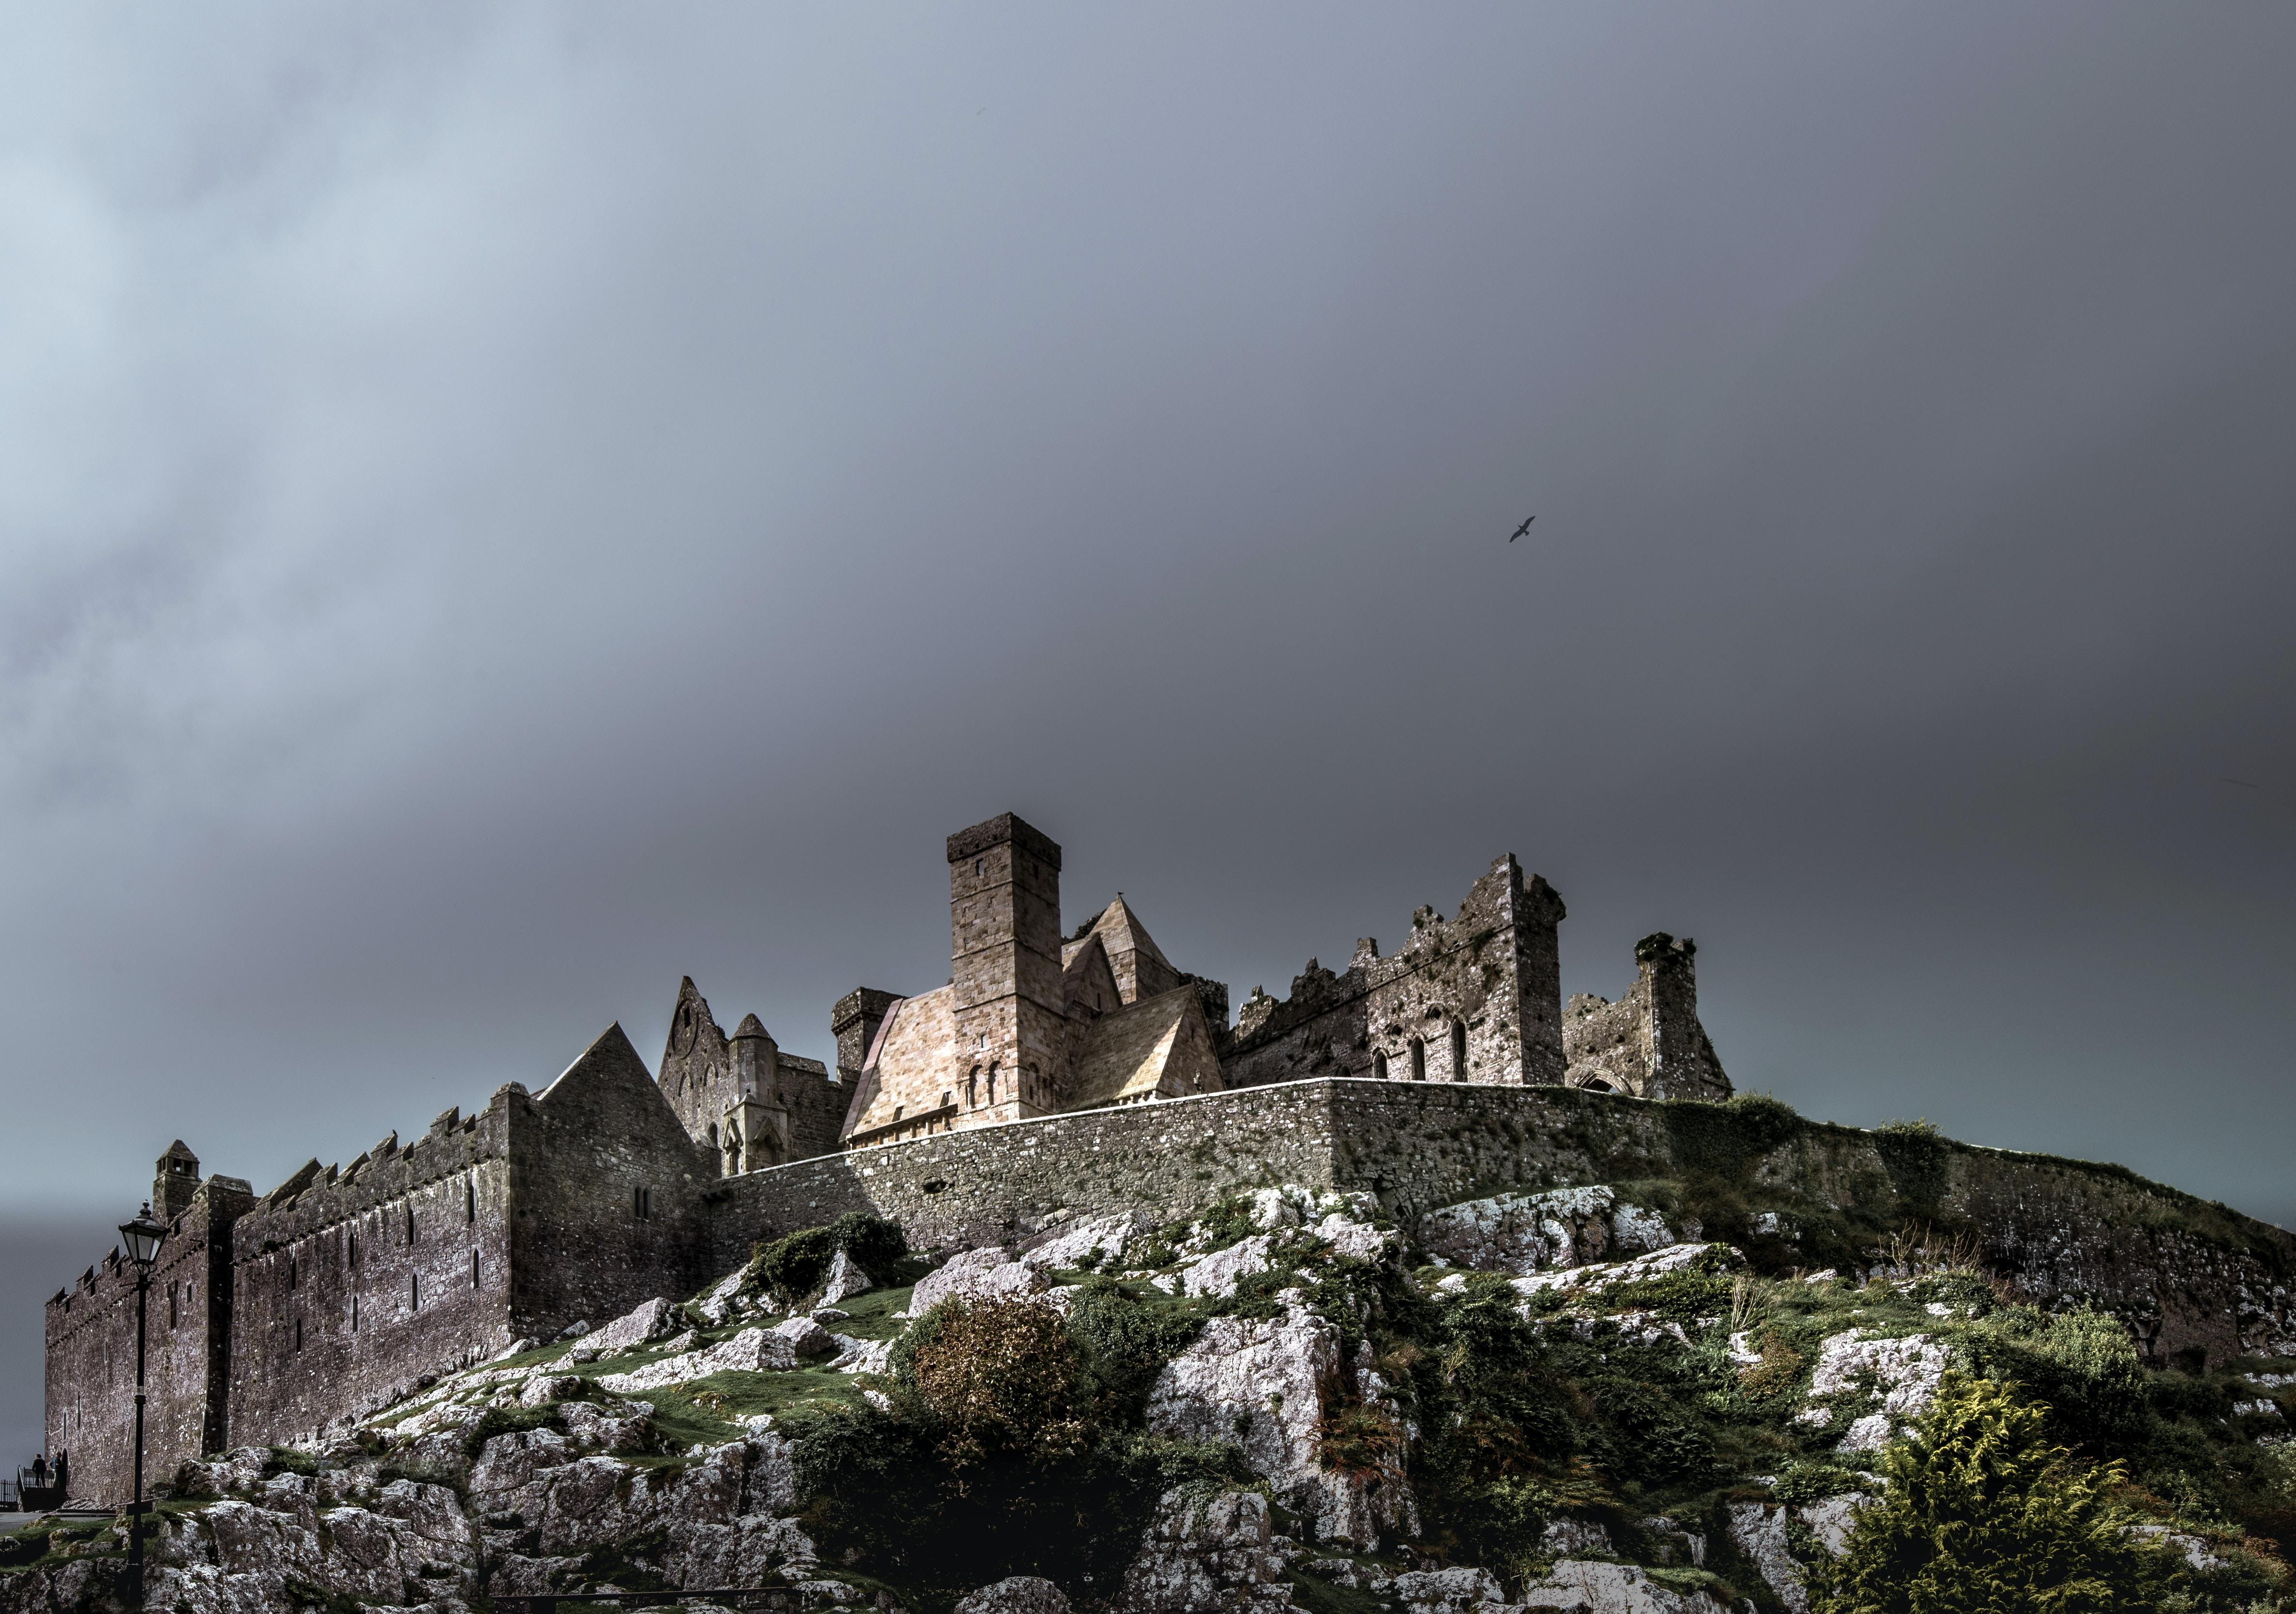 brown concrete castle under black clouds during daytime